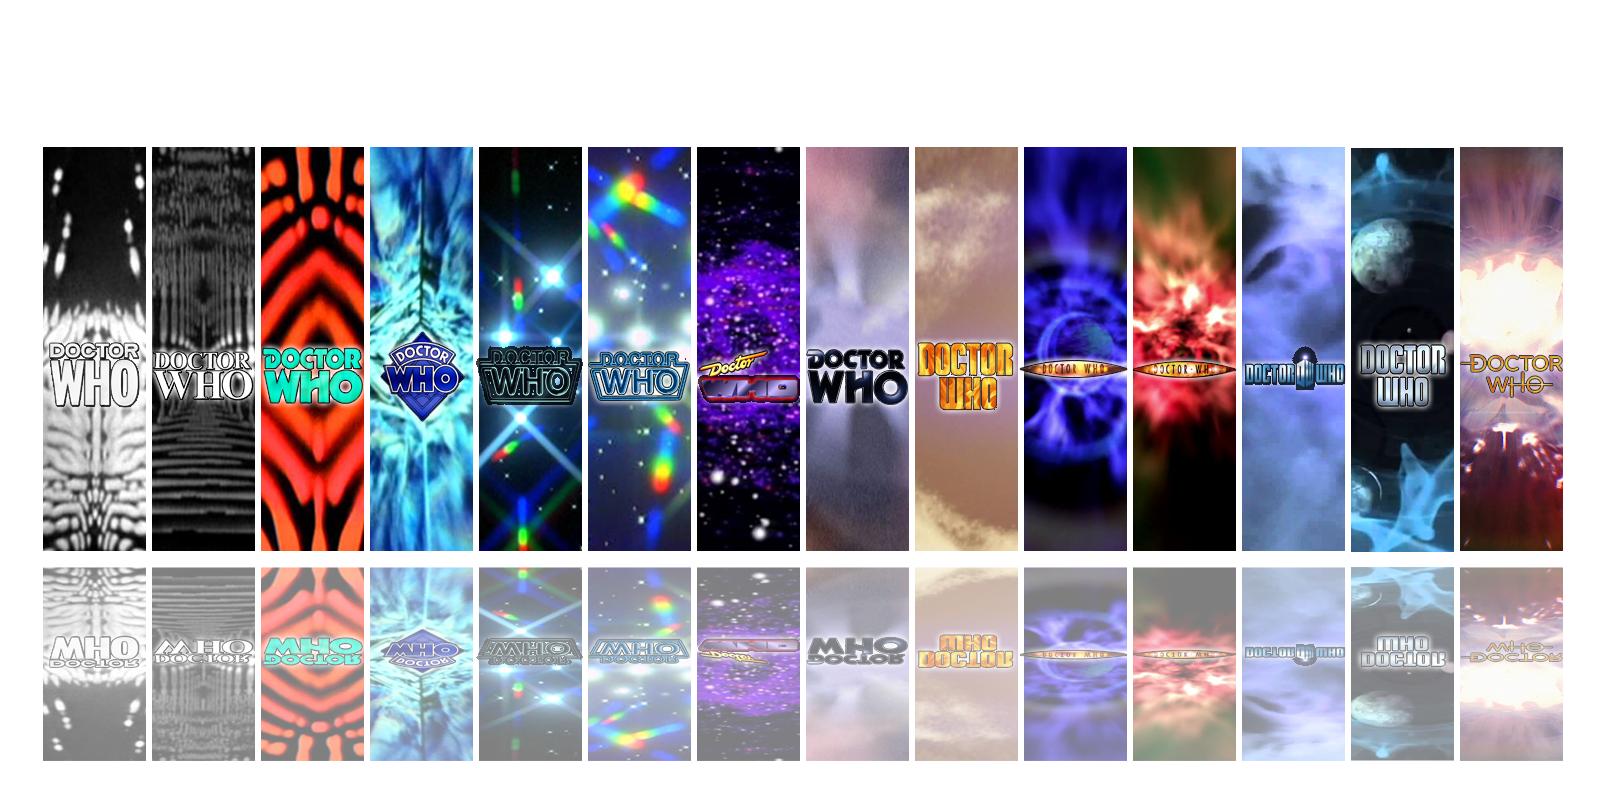 Doctors Logos Wallpaper 2 By Vvjosephvv On Deviantart